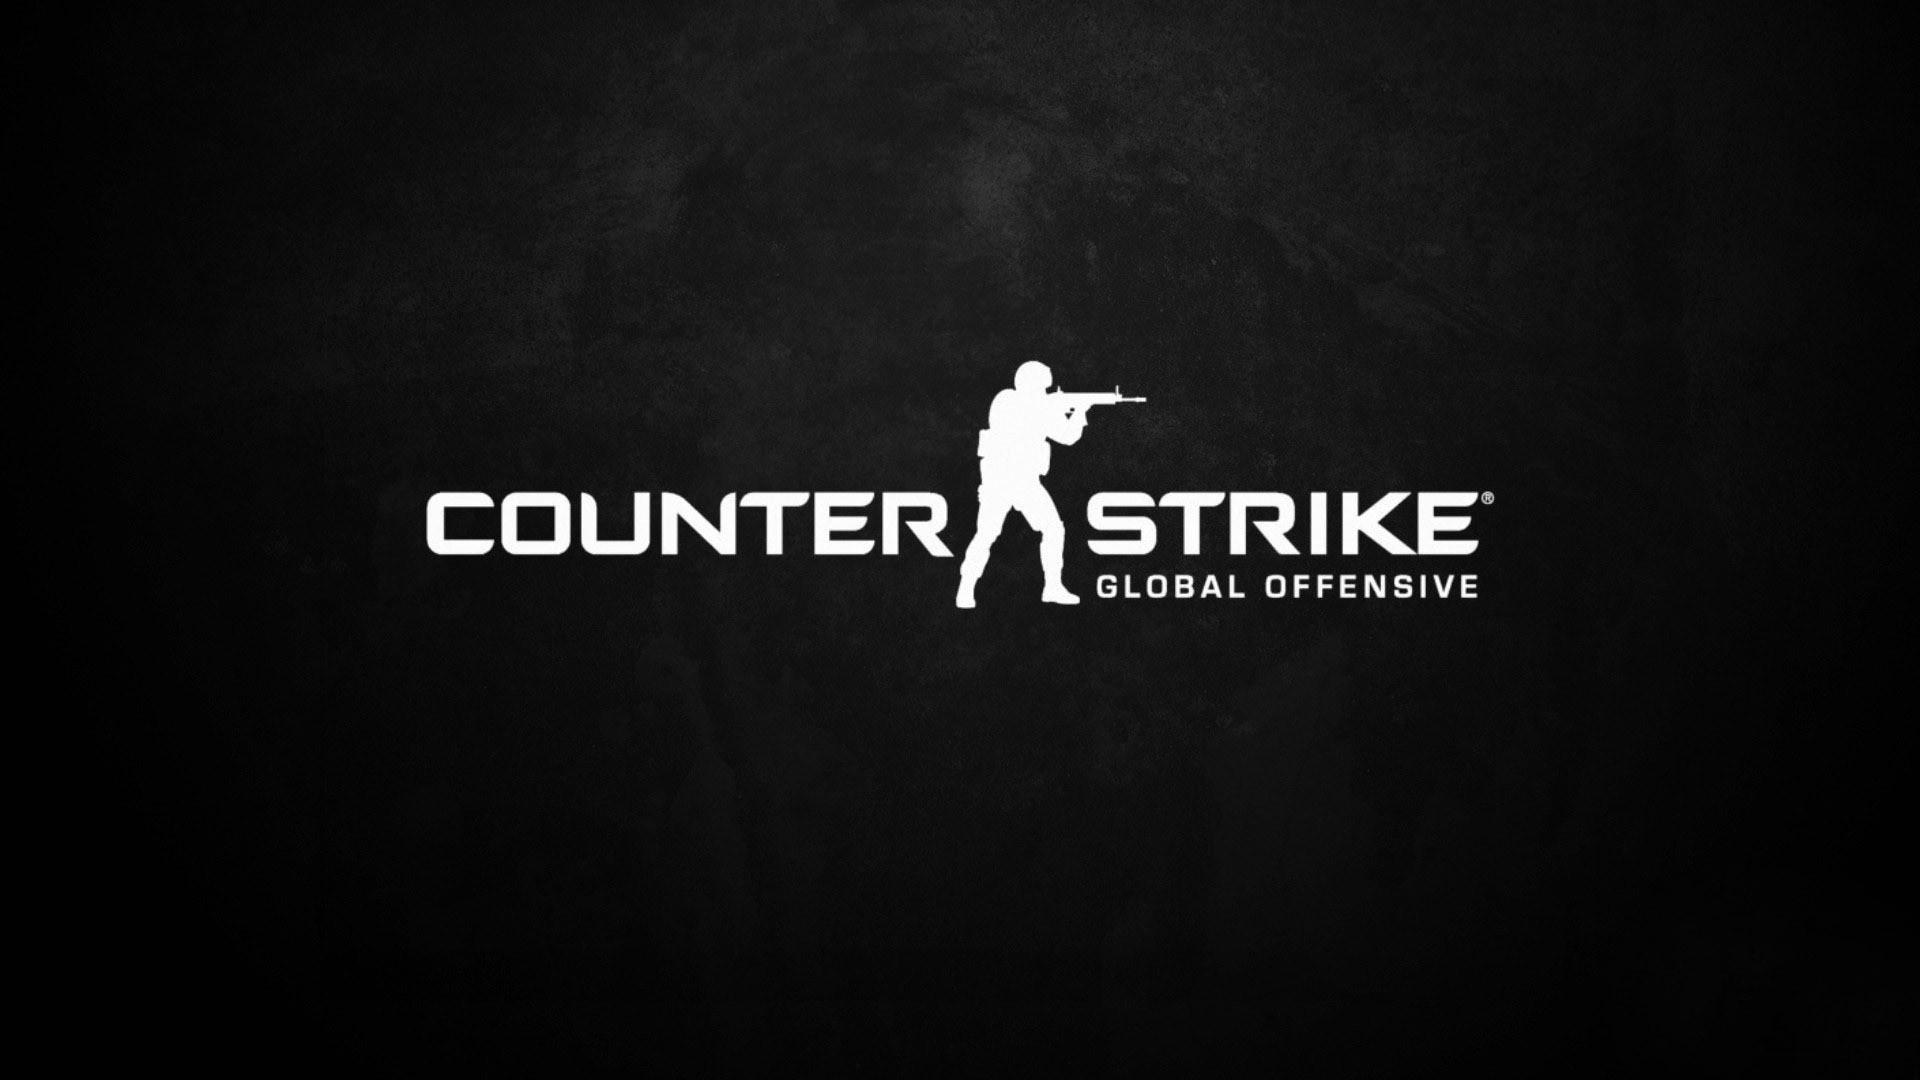 … Counter Strike Wallpaper …